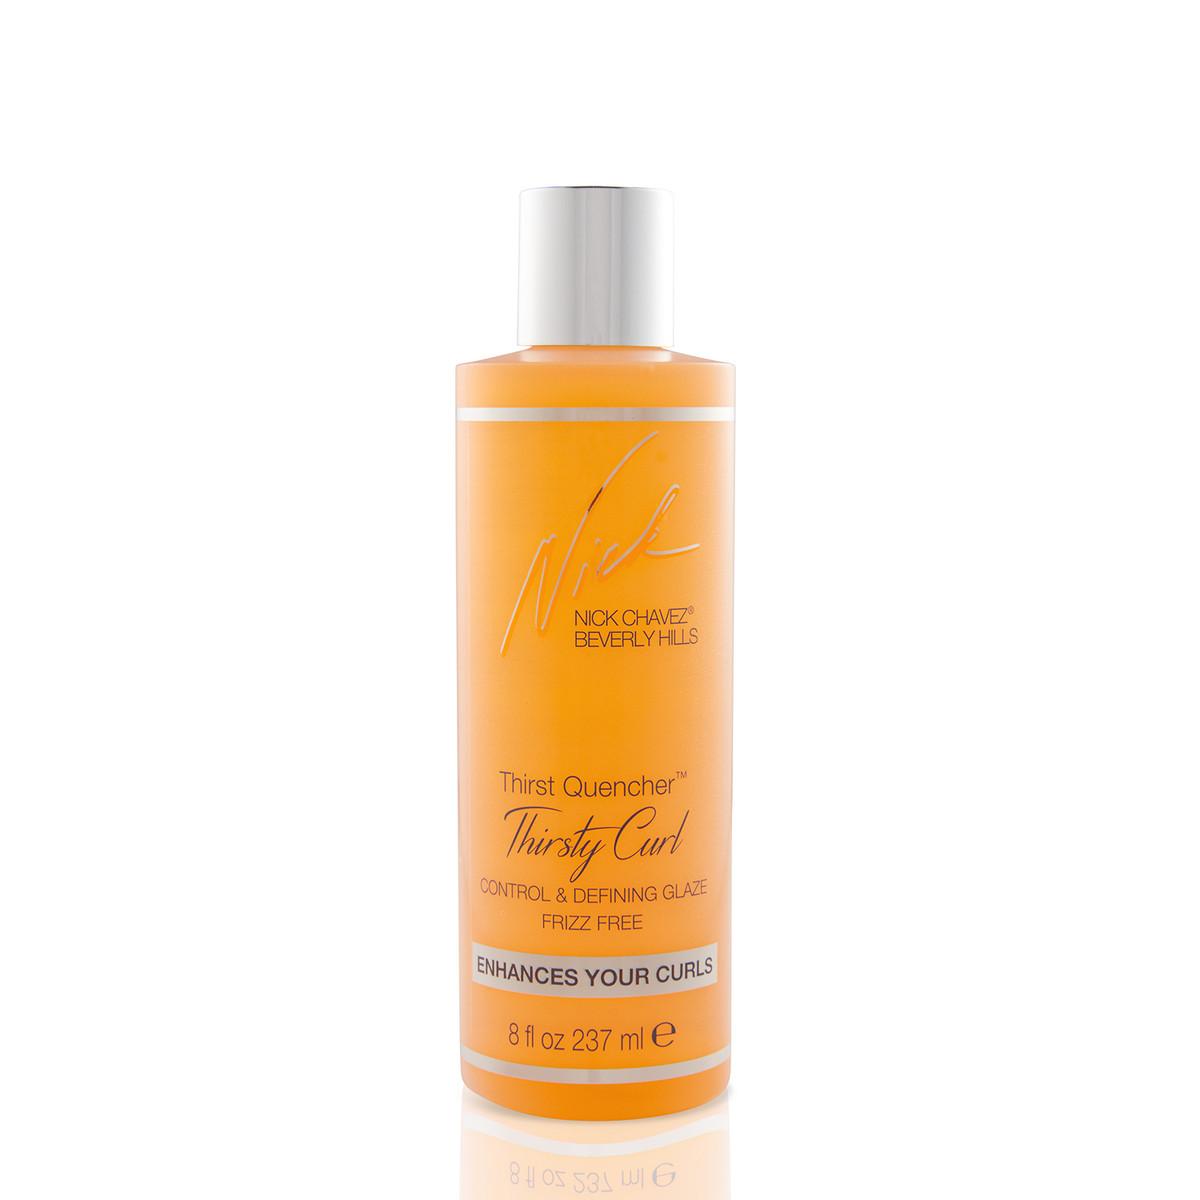 8oz Thirst Quencher Thirsty Curl Control & Defining Glaze, Frizz Free!